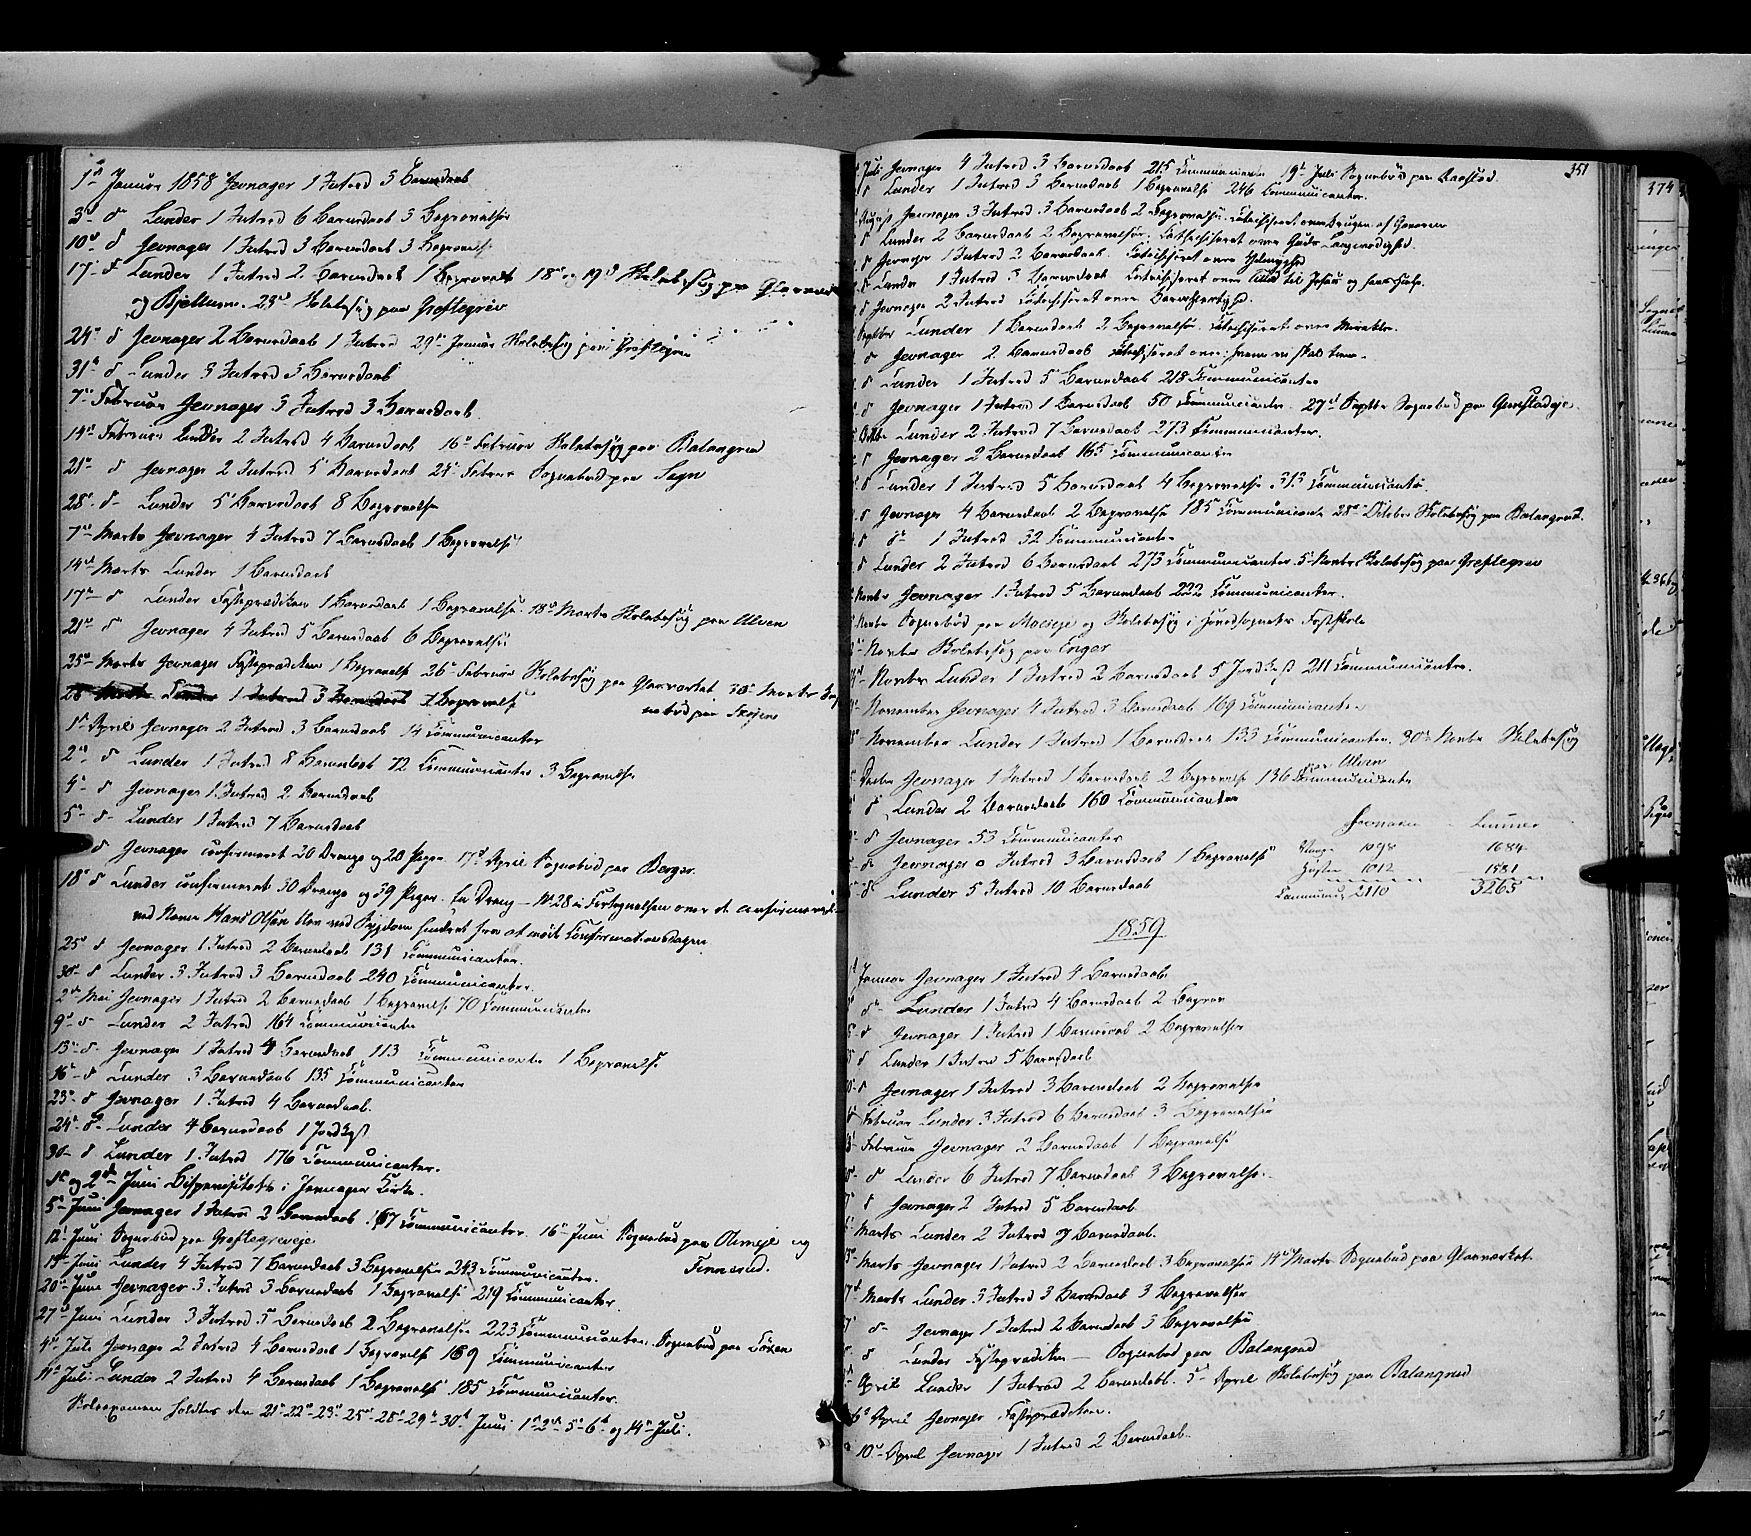 SAH, Jevnaker prestekontor, Ministerialbok nr. 7, 1858-1876, s. 351